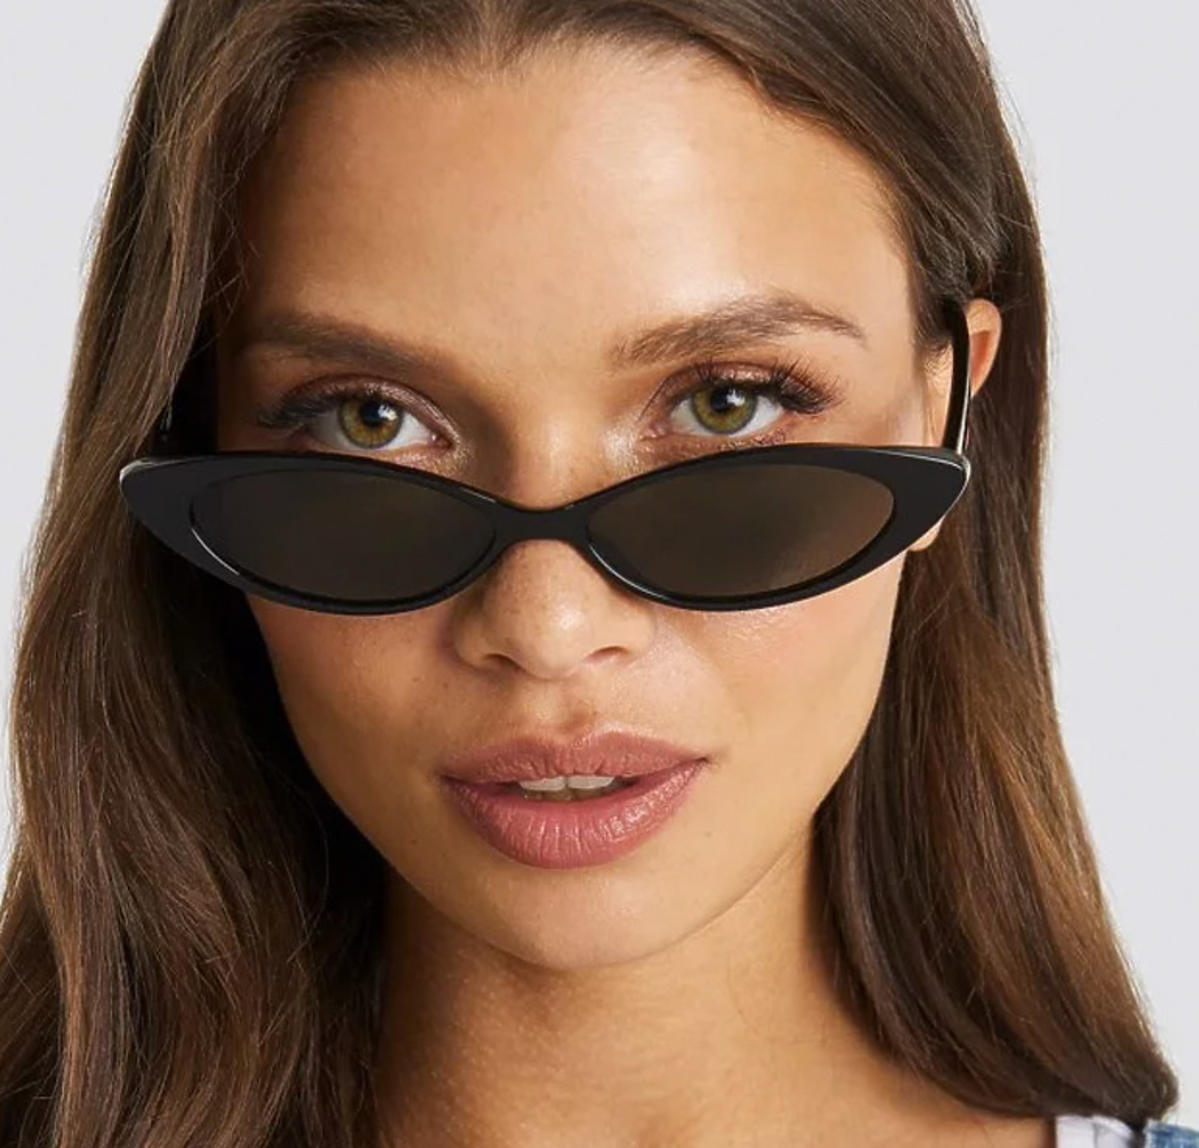 Slim Eye Cat Sunglasses Julia Wieniawa x NA-KD, Czarny